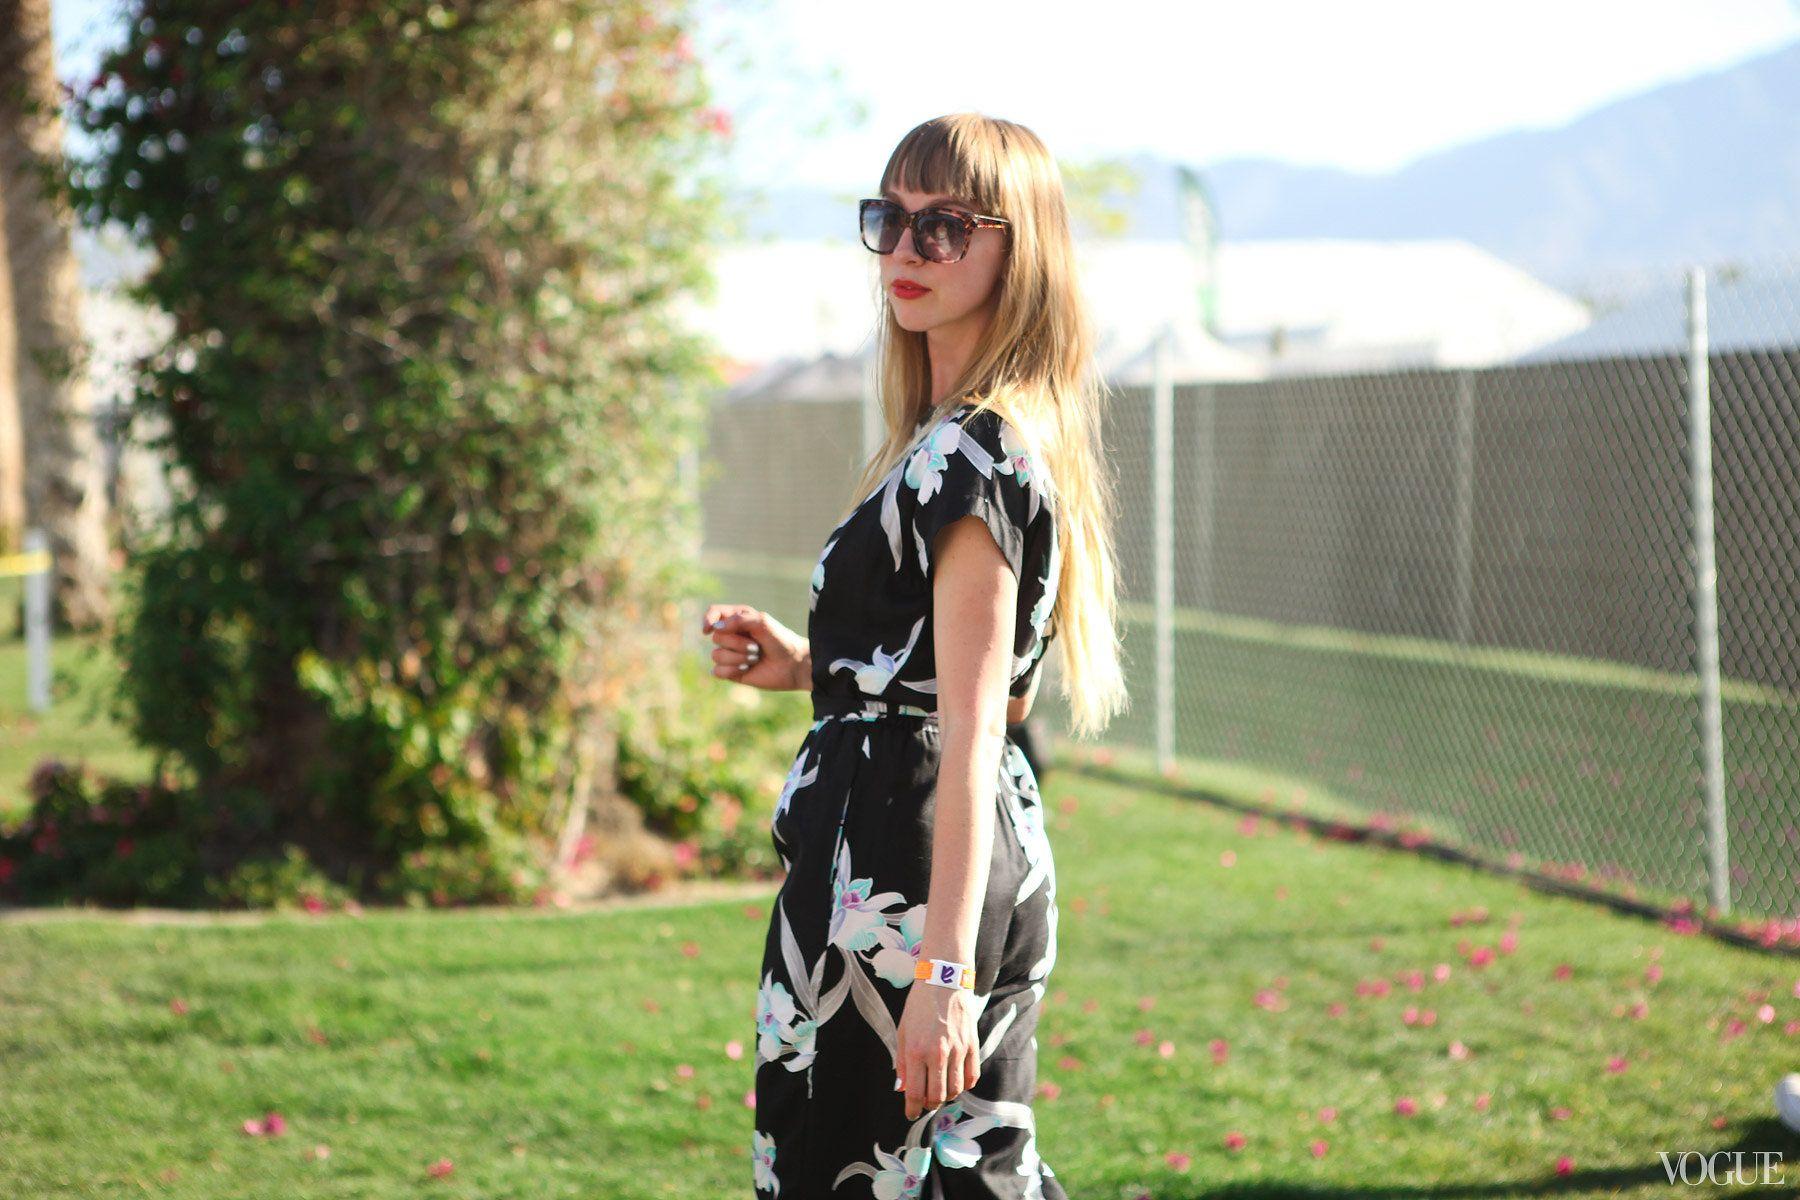 Photos: Coachella 2013 Street Style